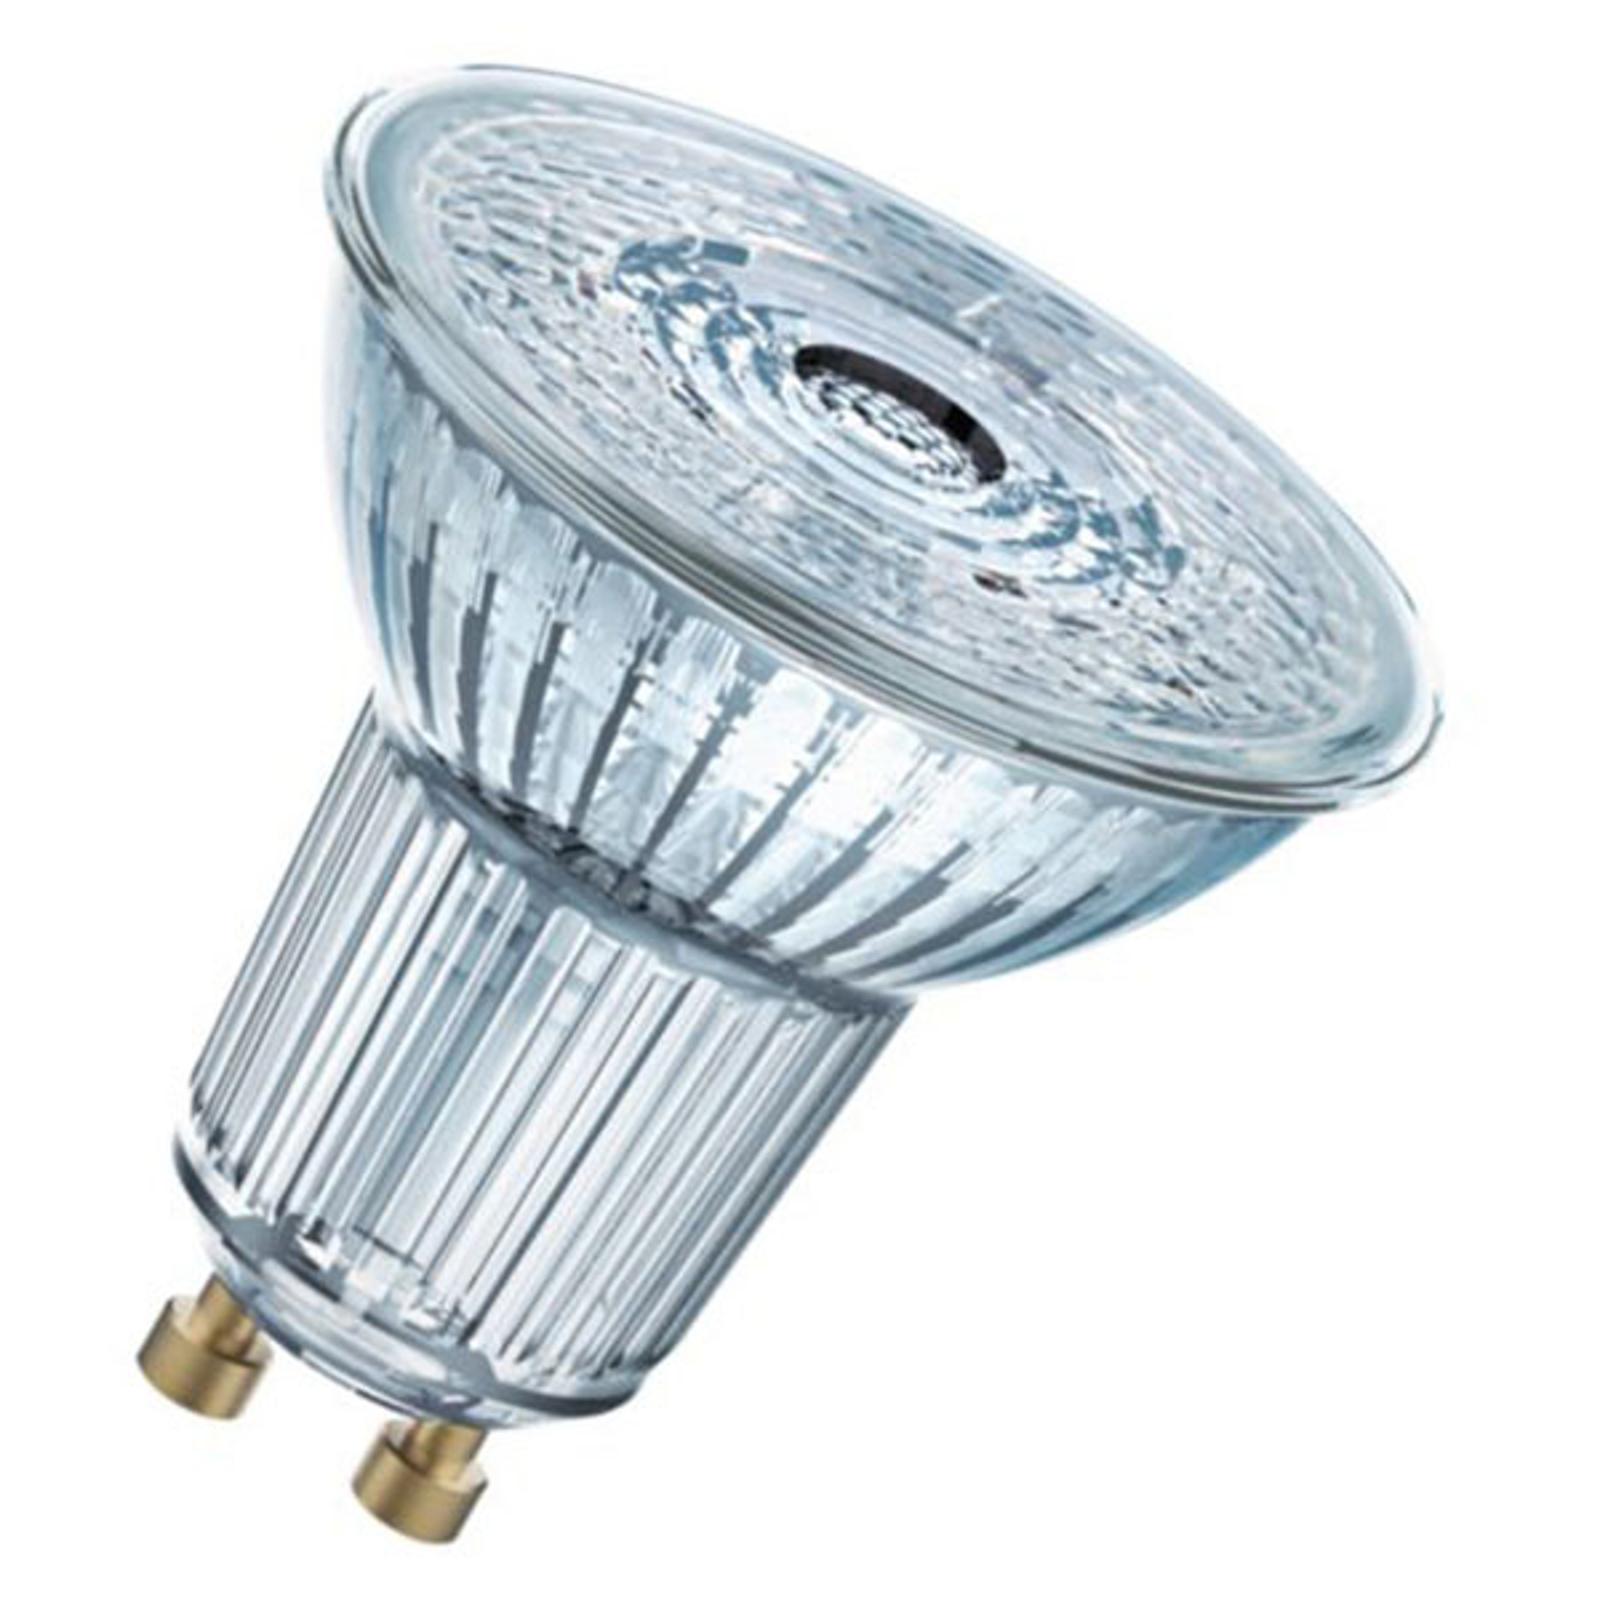 OSRAM LED-glassreflektor GU10 3,7W 927 36° dimbar